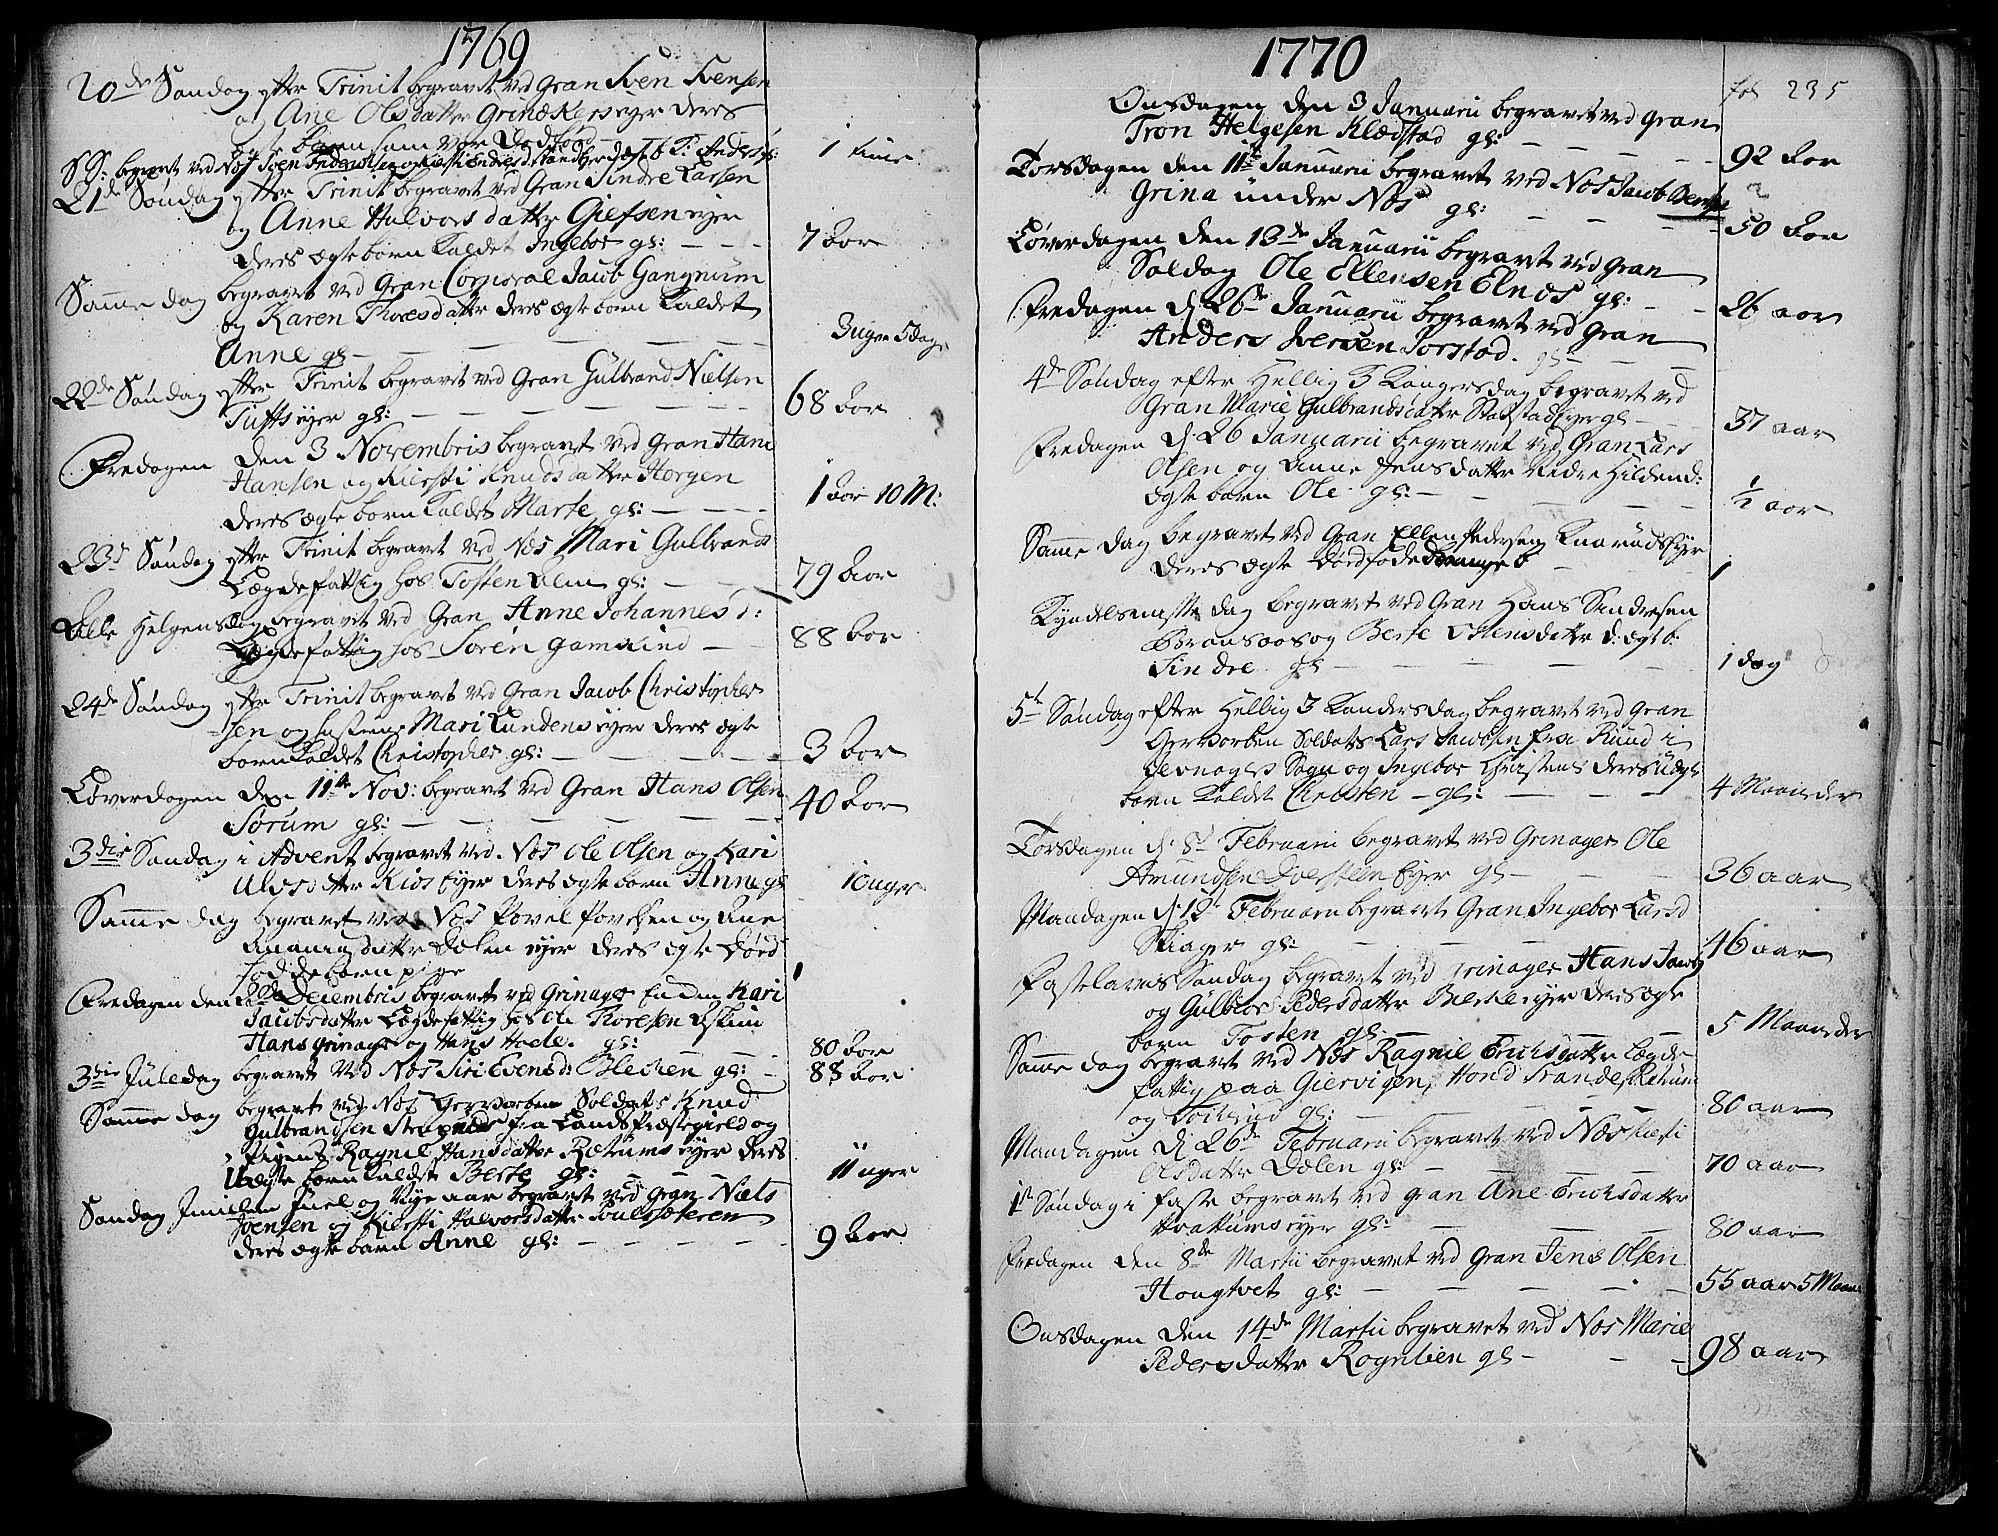 SAH, Gran prestekontor, Ministerialbok nr. 4, 1759-1775, s. 235